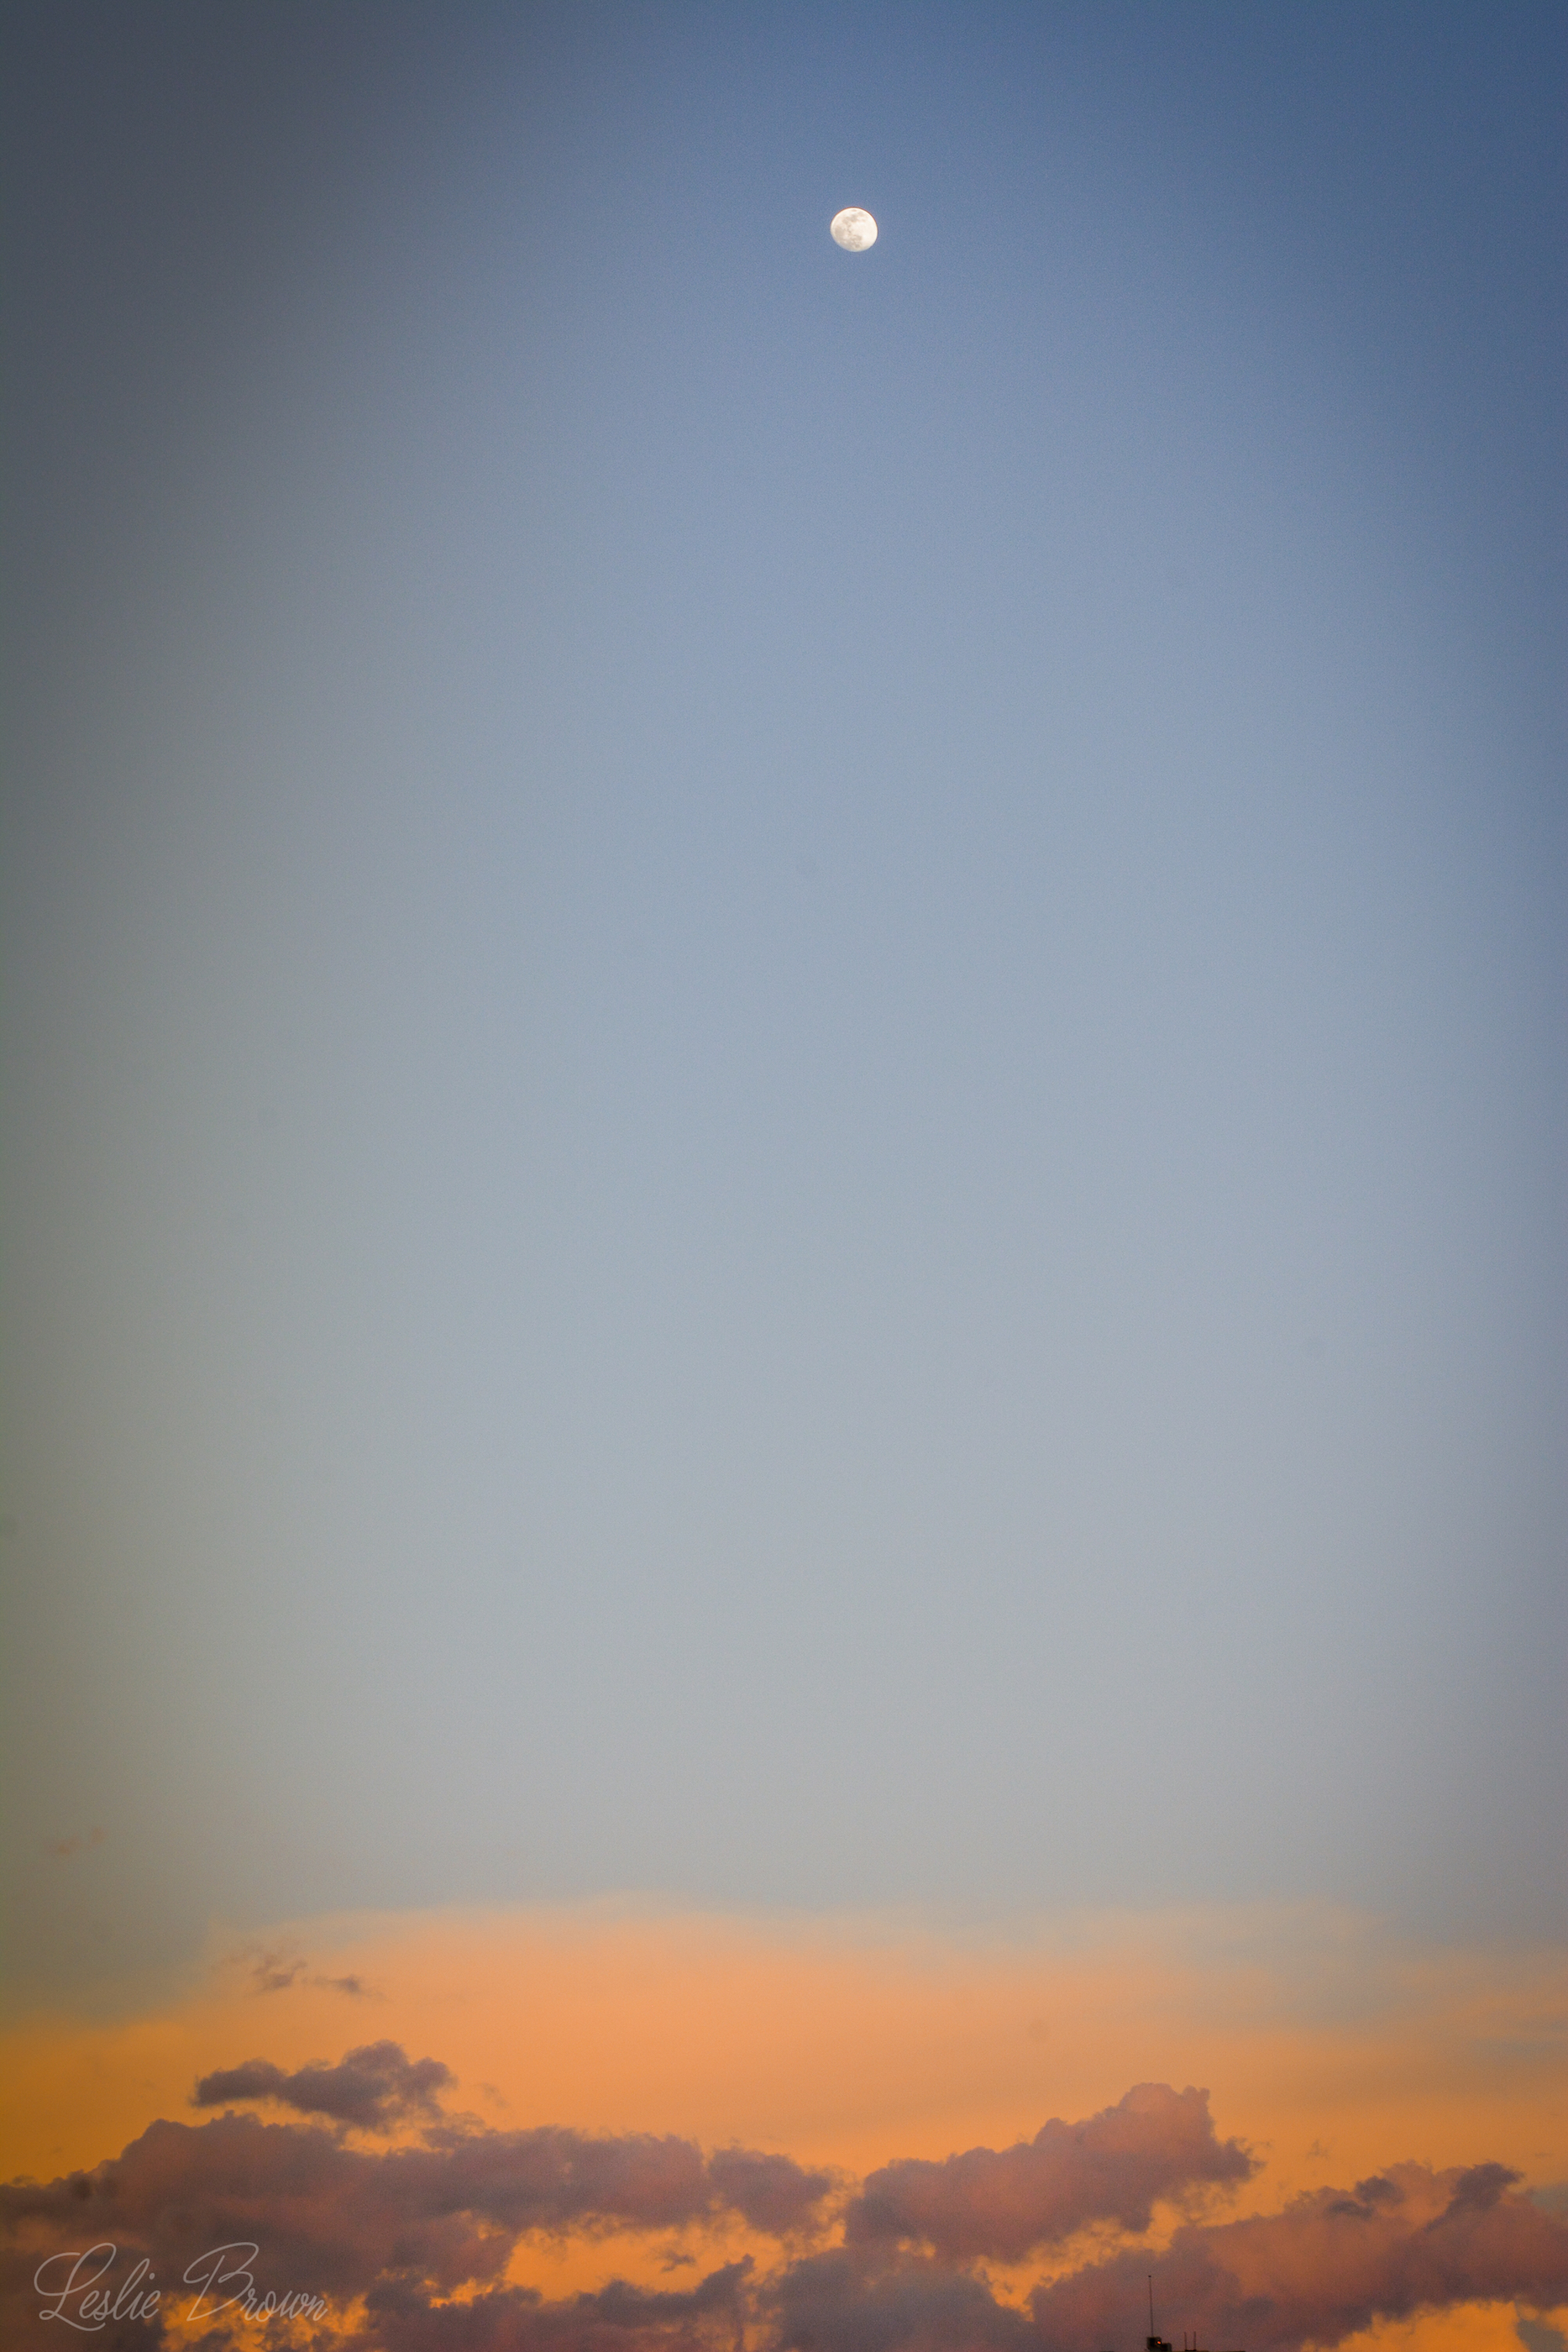 Moon and Clouds - Leslie Brown